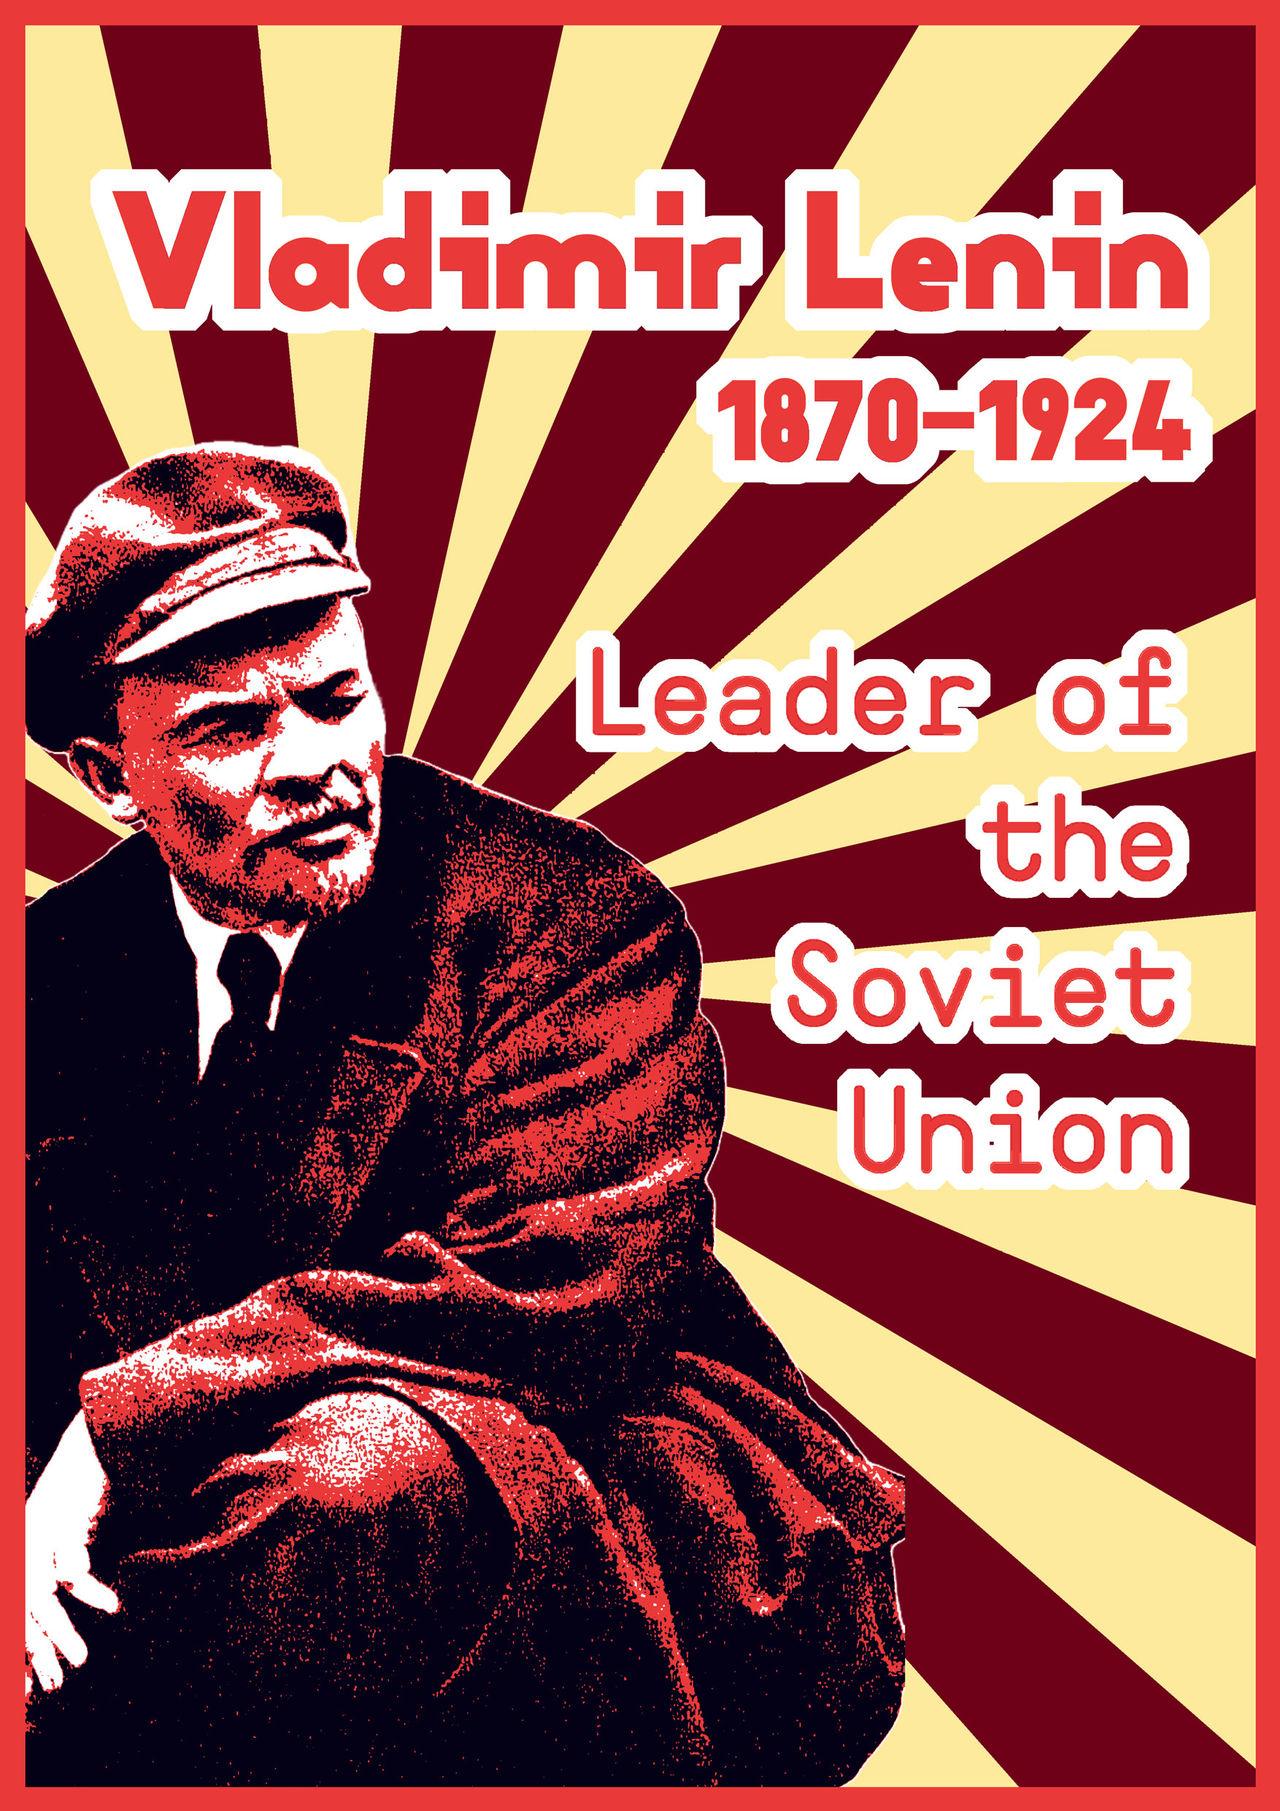 Faces of Communism : Lenin